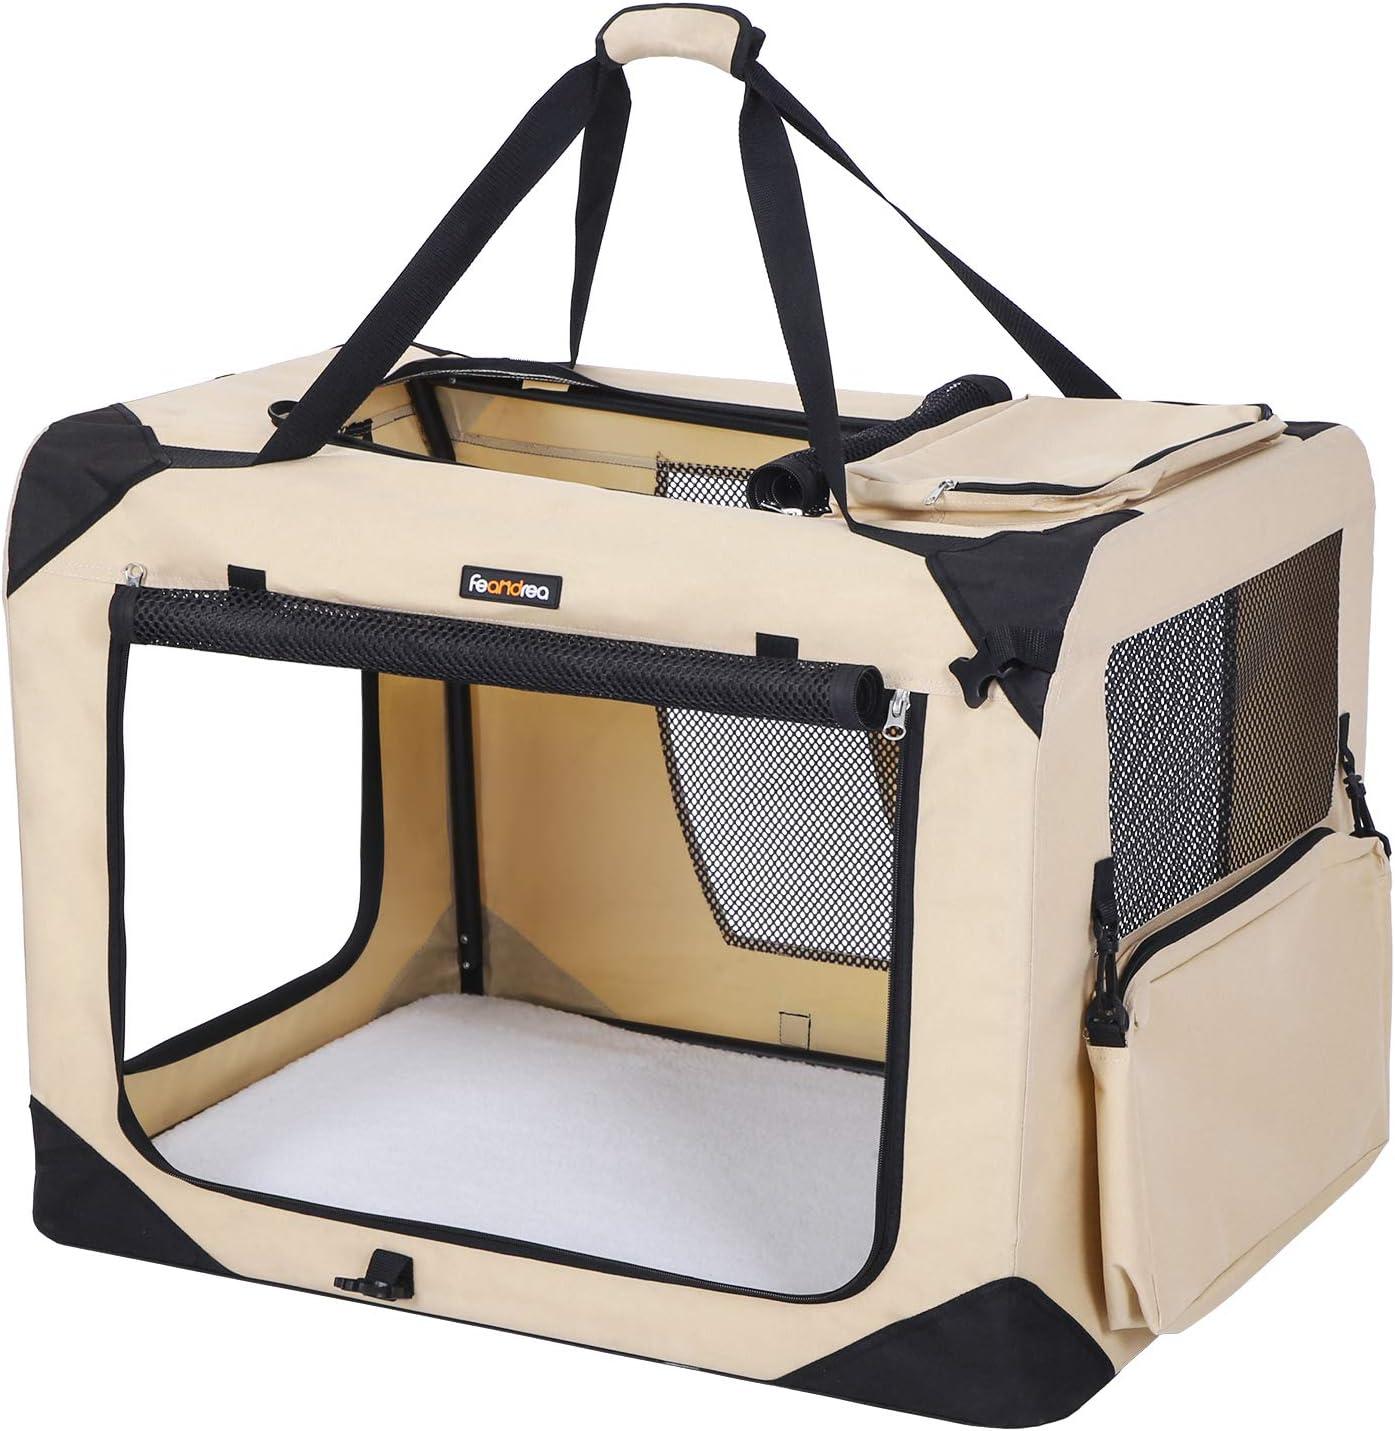 FEANDREA Bolsa de Transporte para Mascotas Transportín Plegable para Perro Portador Tela Oxford Beige XXXL 102 x 69 x 69 cm PDC10W: Amazon.es: Productos para mascotas